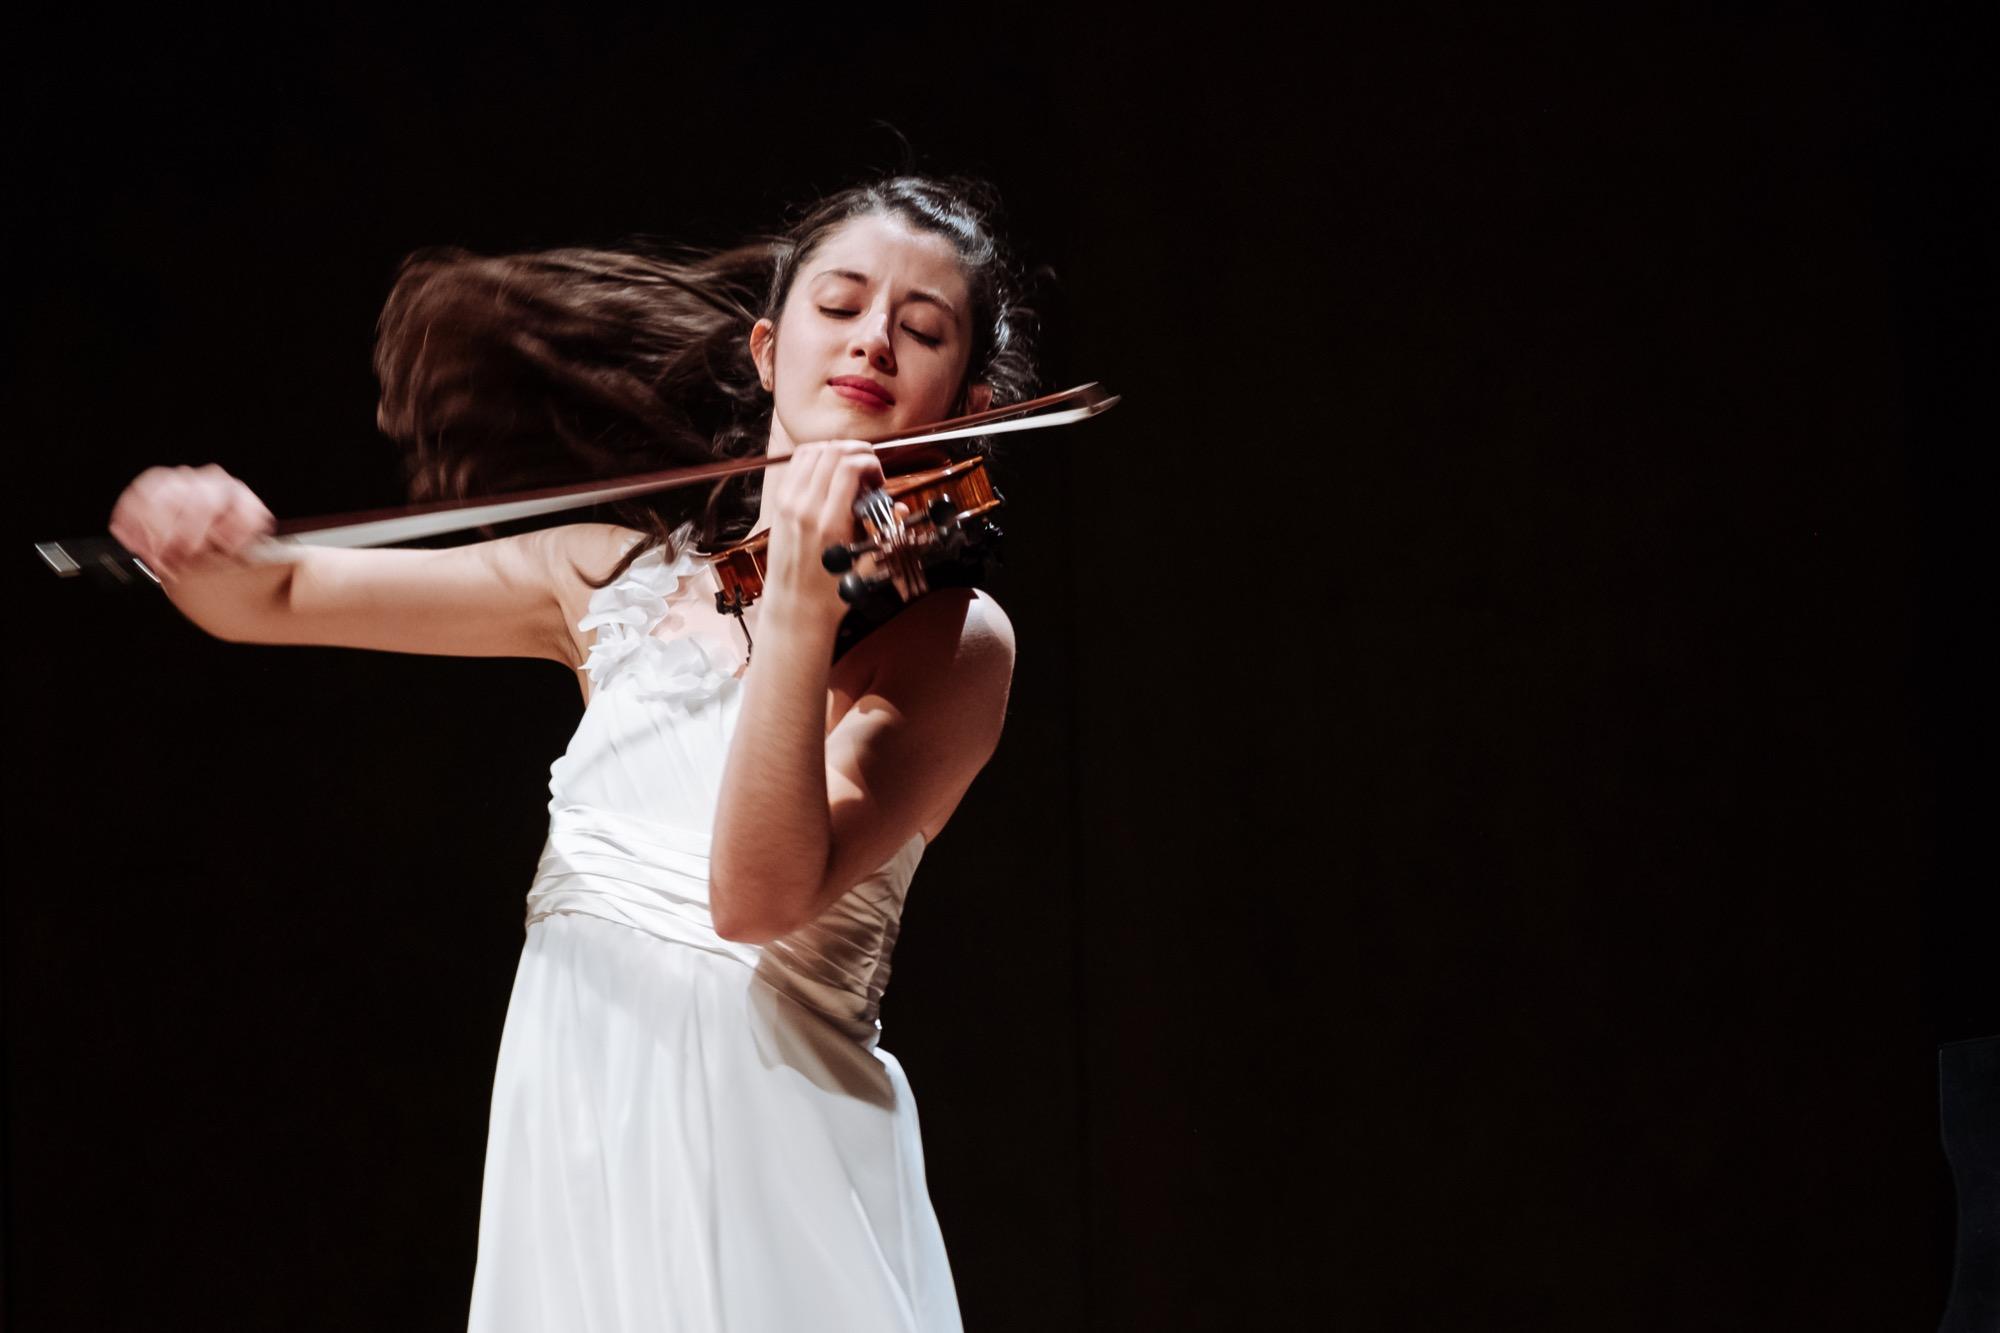 Maria Dueñas at the CMIM 2019 Quarterfinals